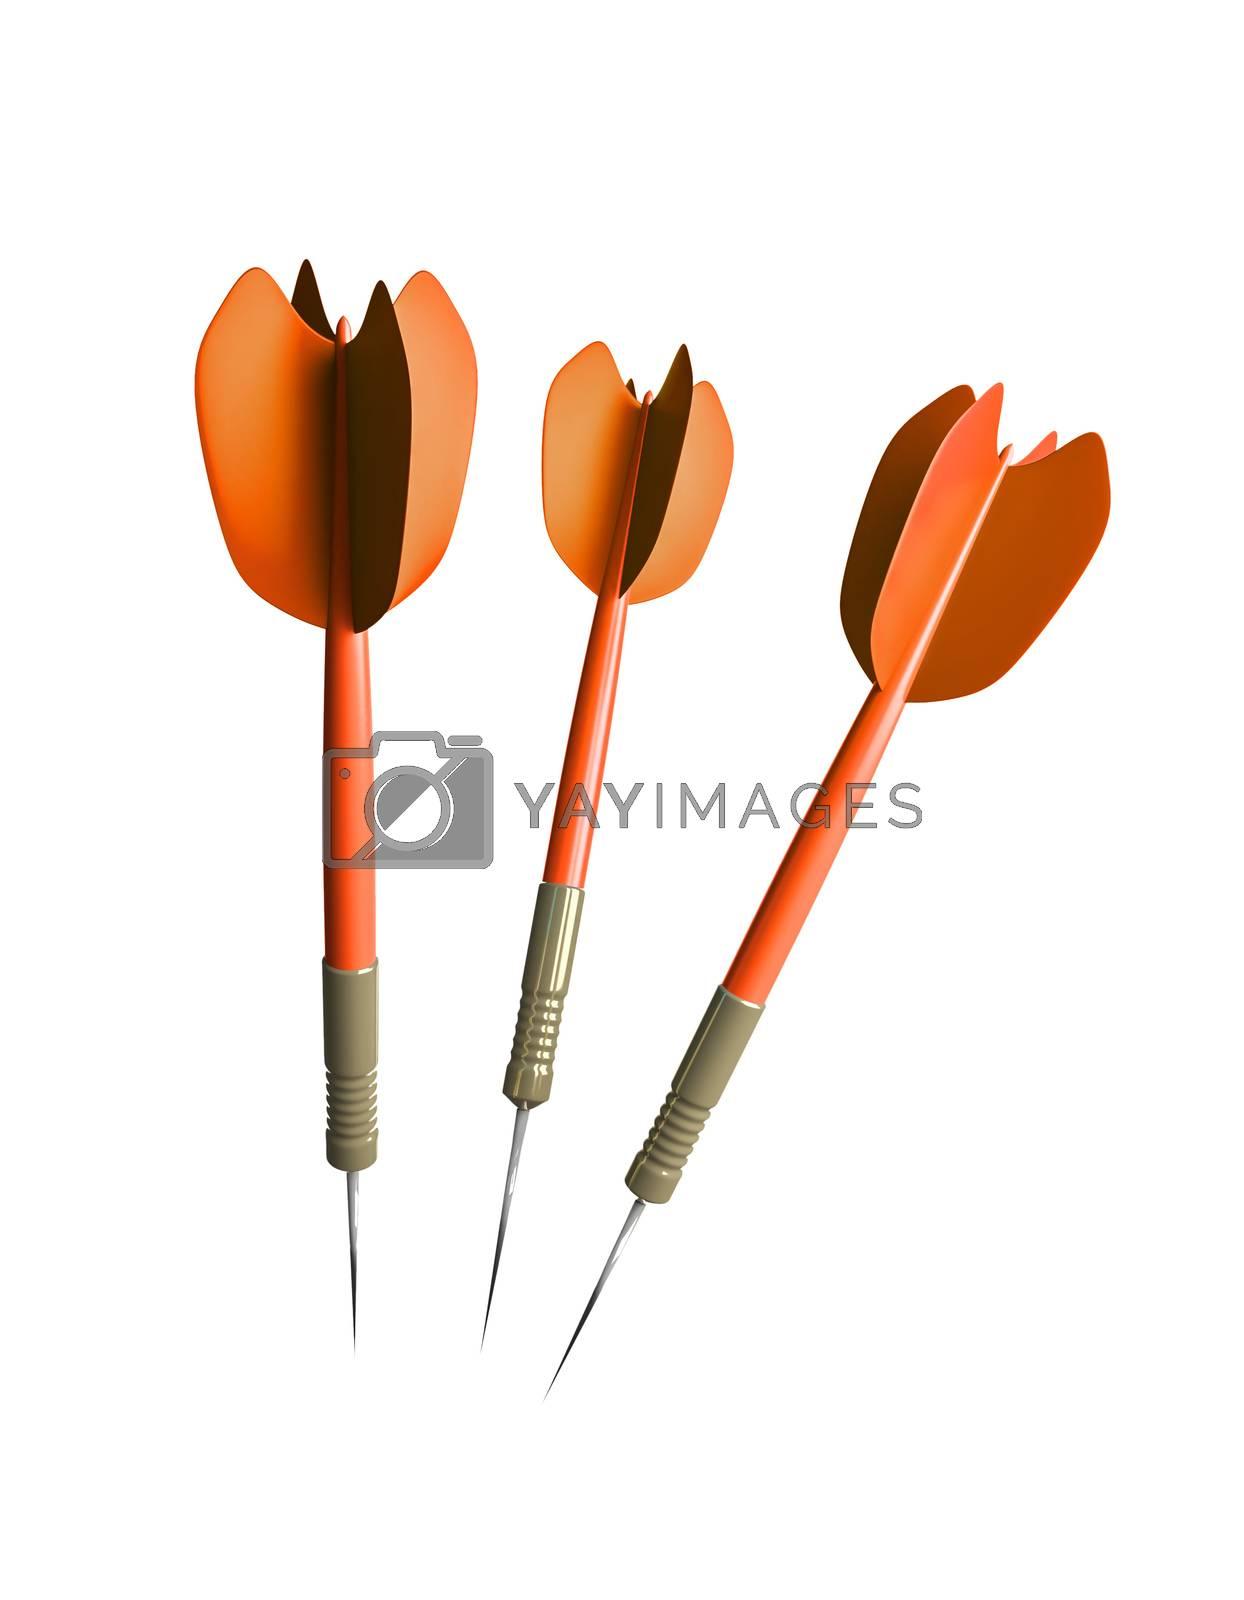 three orange typical darts arrows 3D illustration